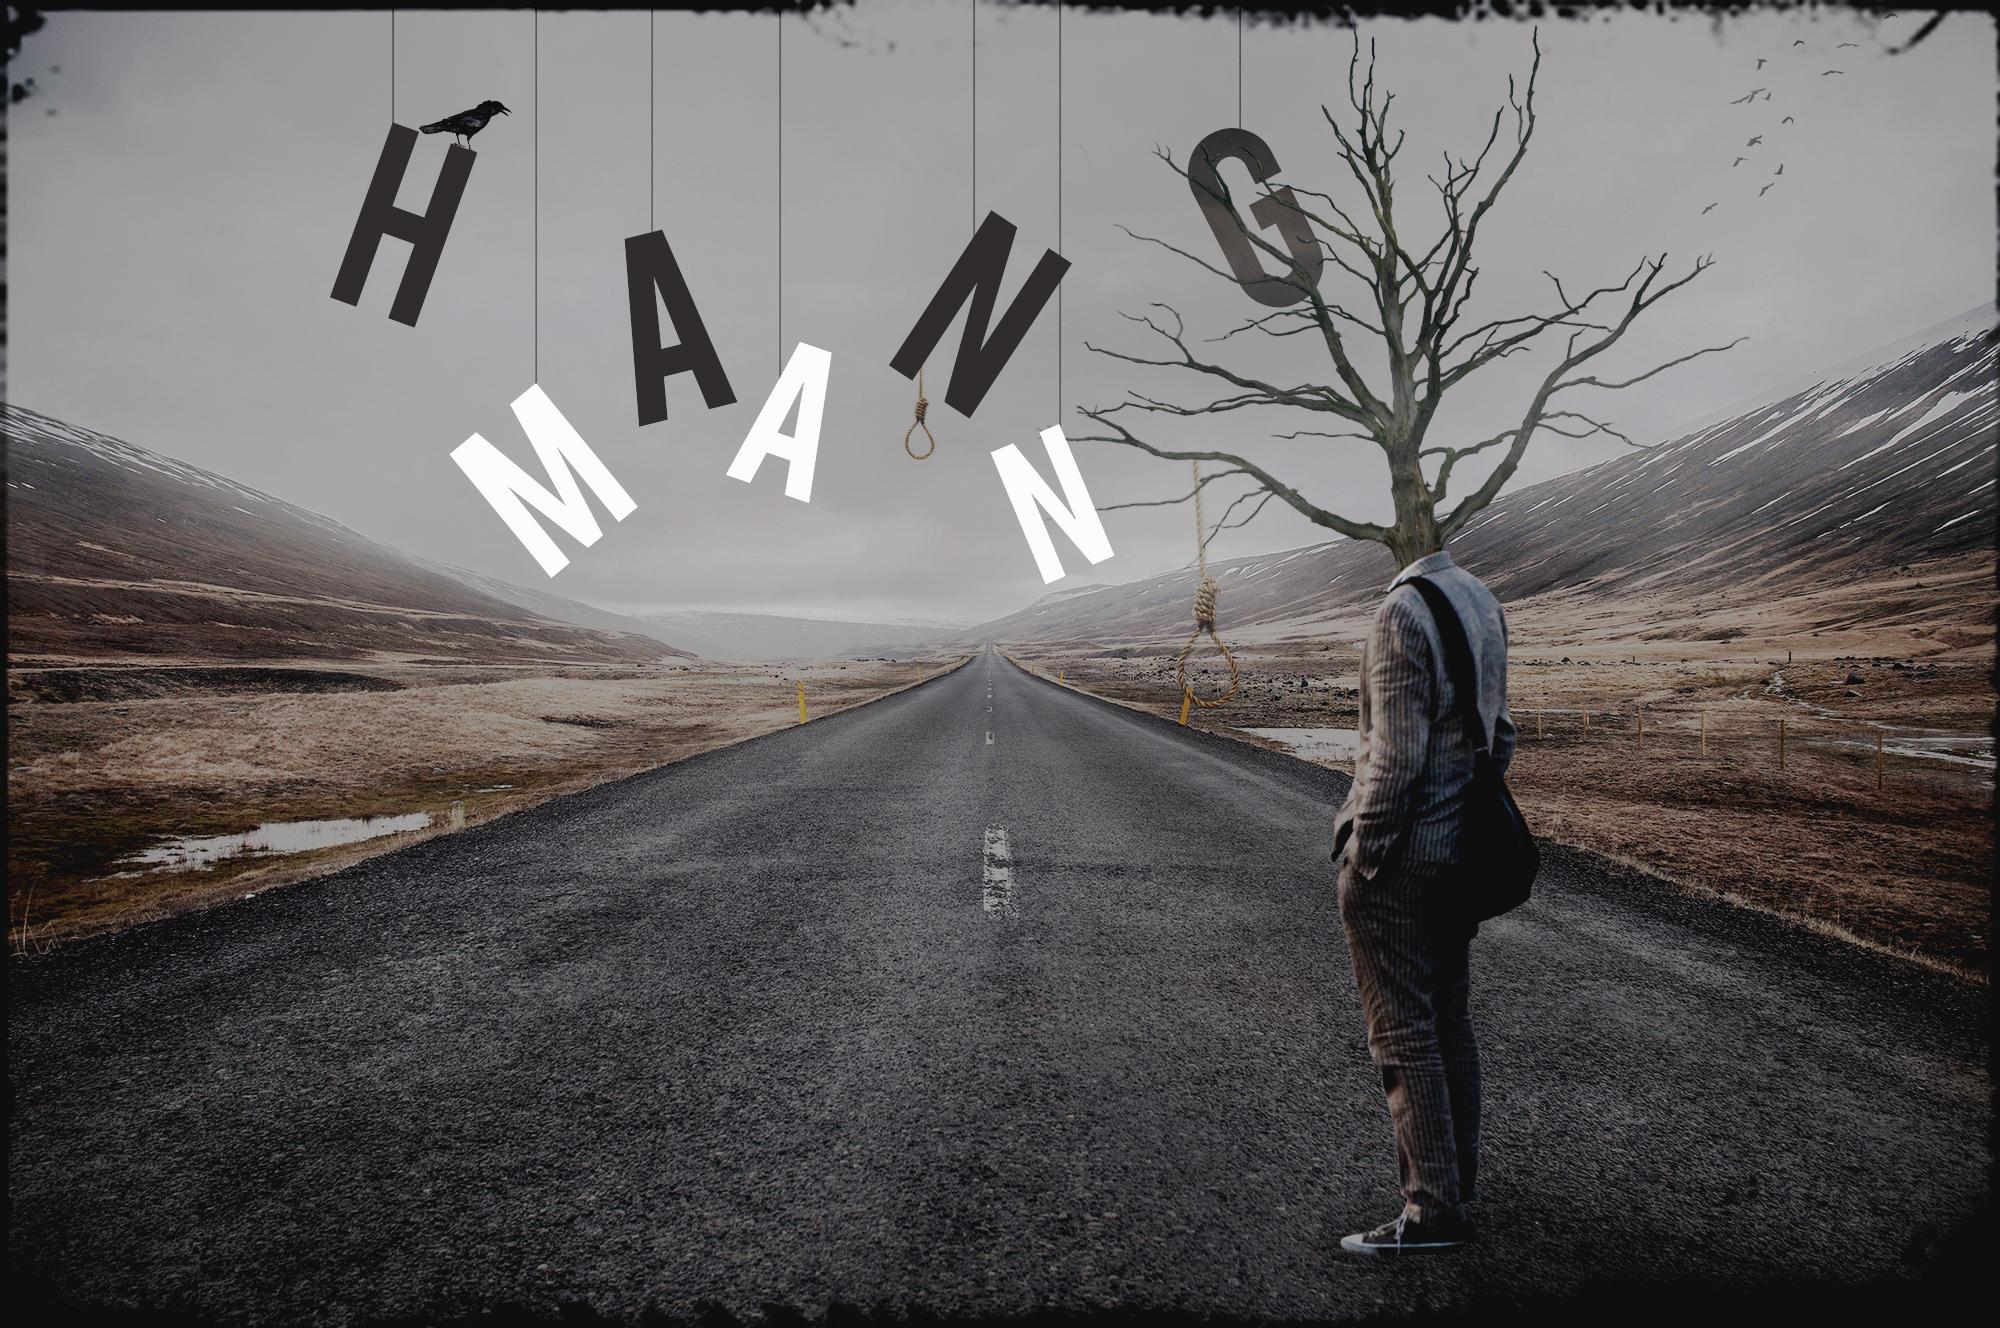 Hang_Man_2.jpg